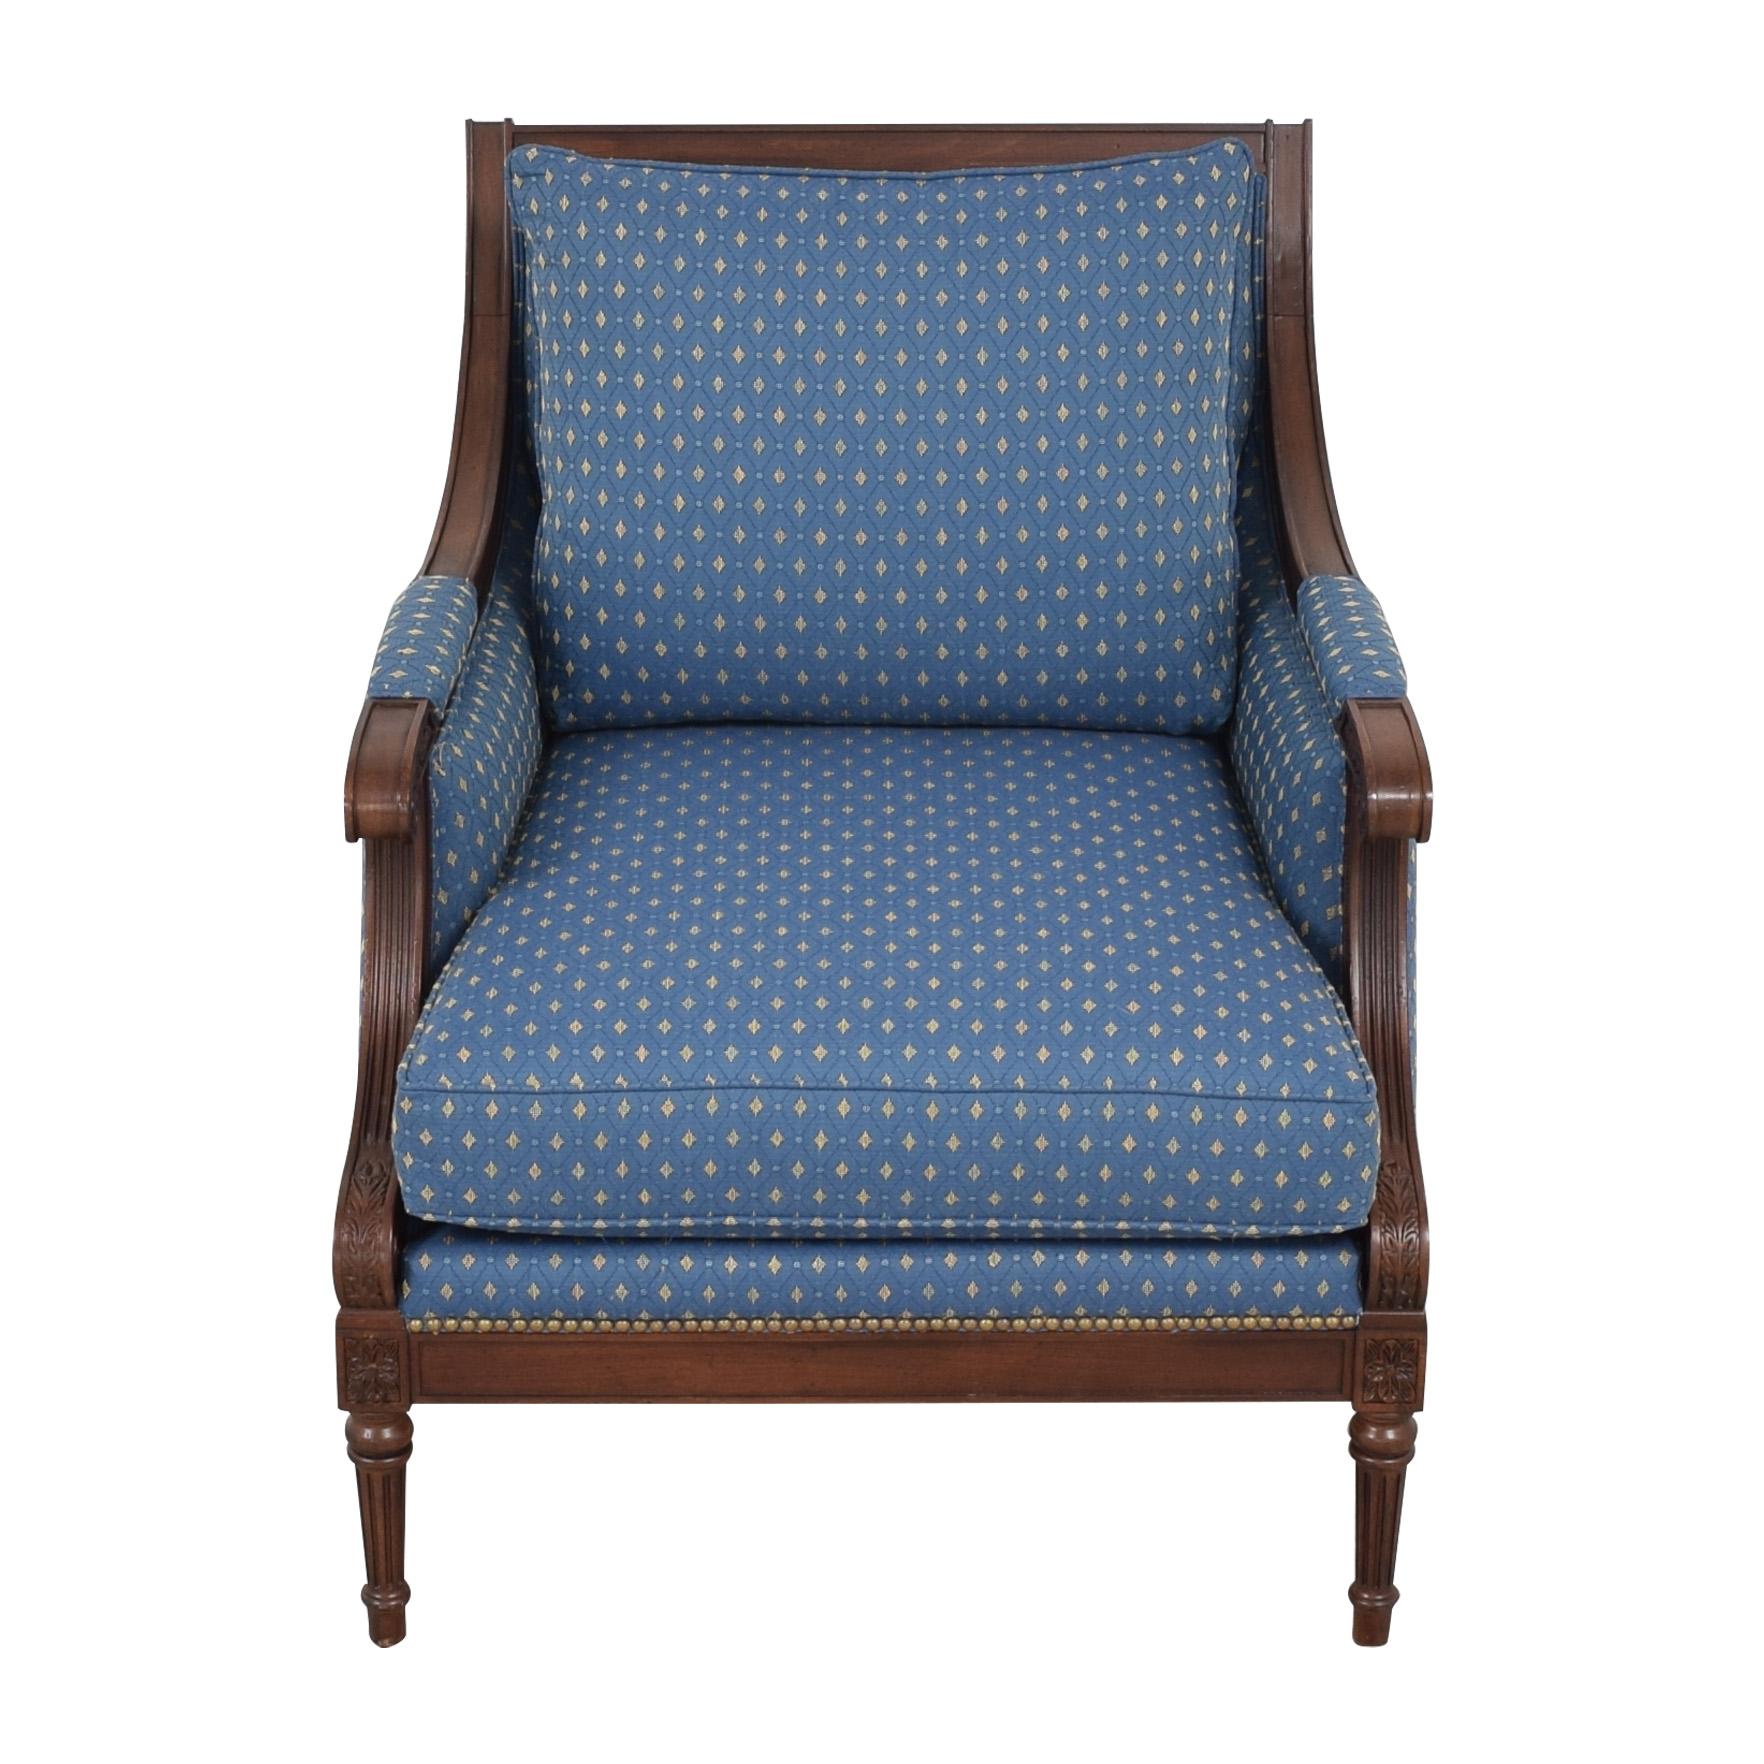 buy Ethan Allen Ethan Allen Accent Chair online